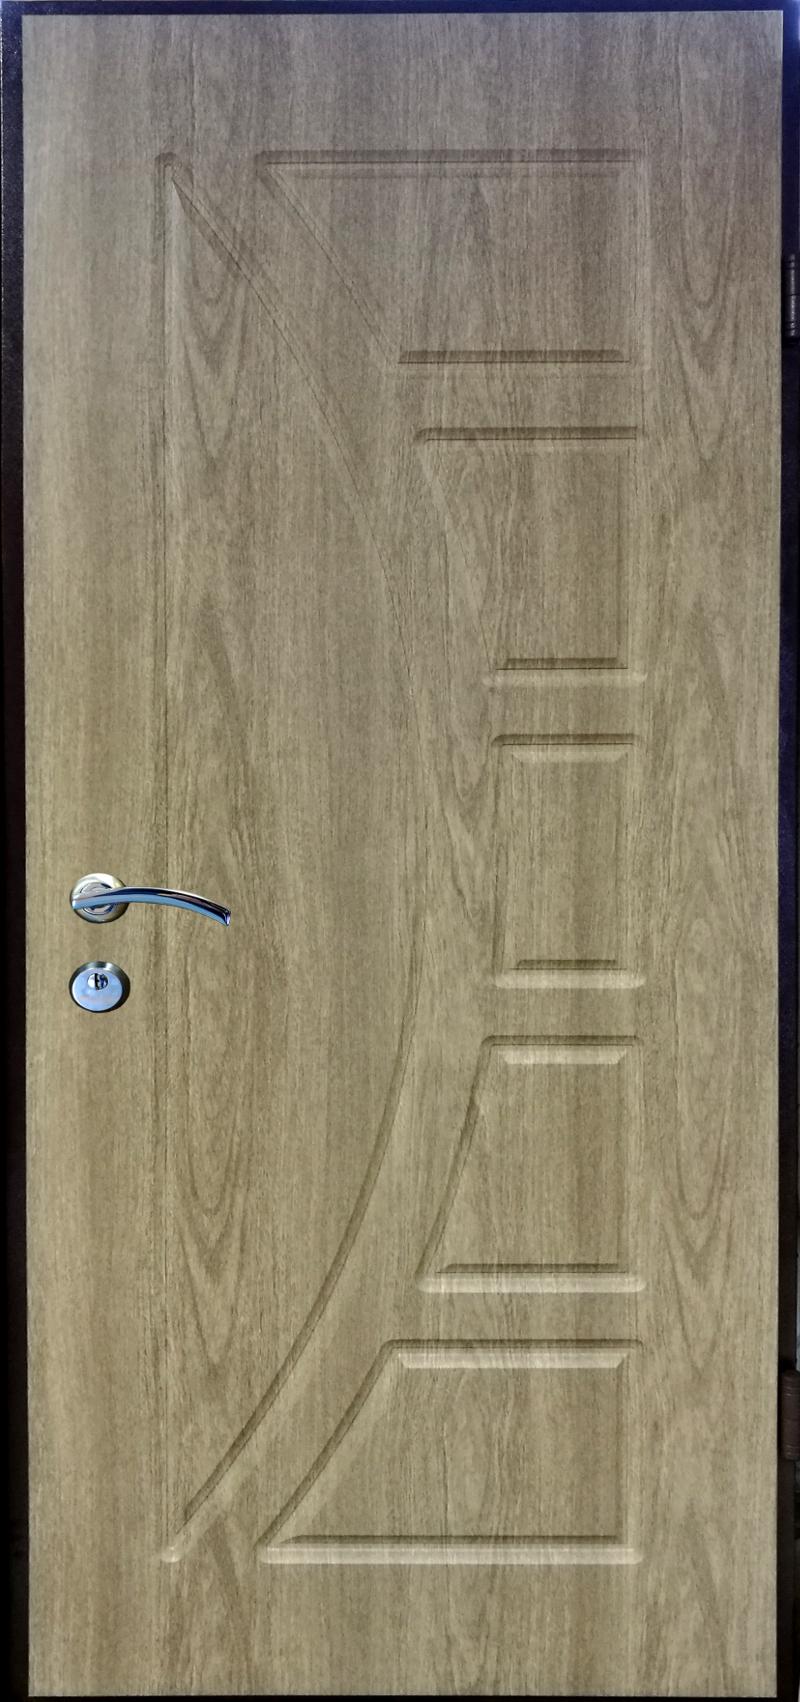 Lauko durys ARMAT2-108 86D karpatų eglė